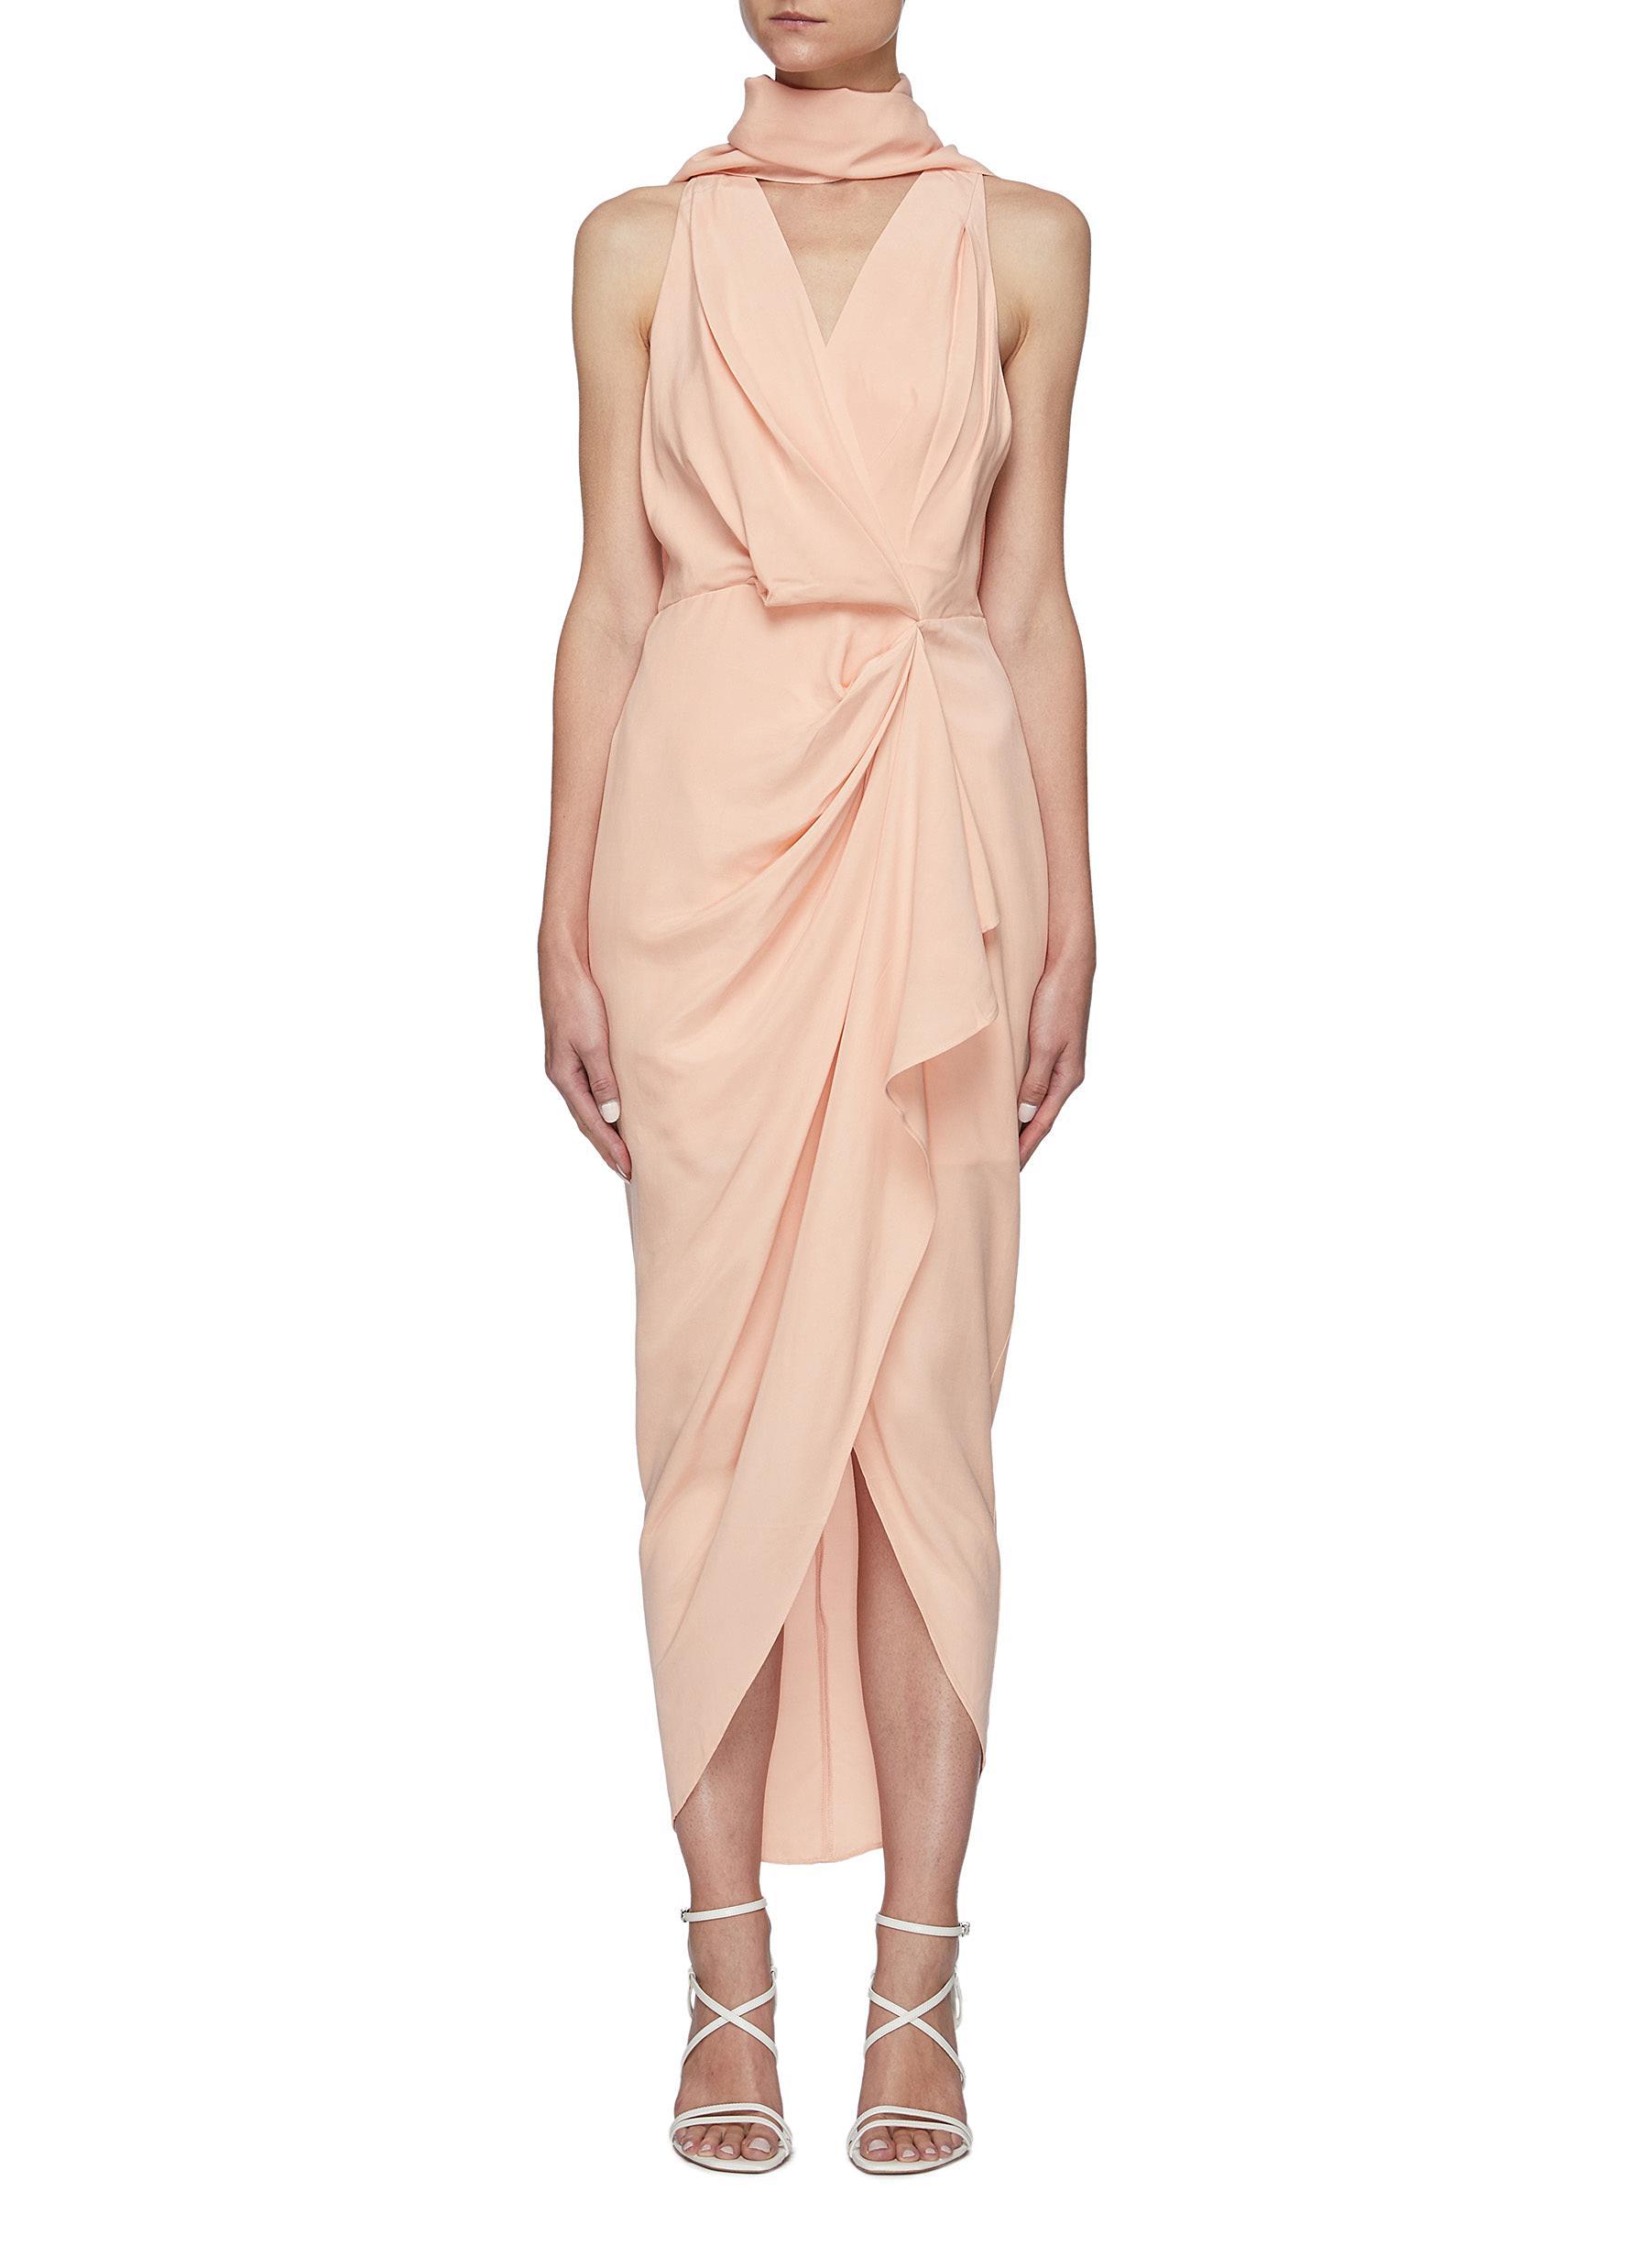 'Daleside' Front Twist Mock Neck Scarf Detail Dress